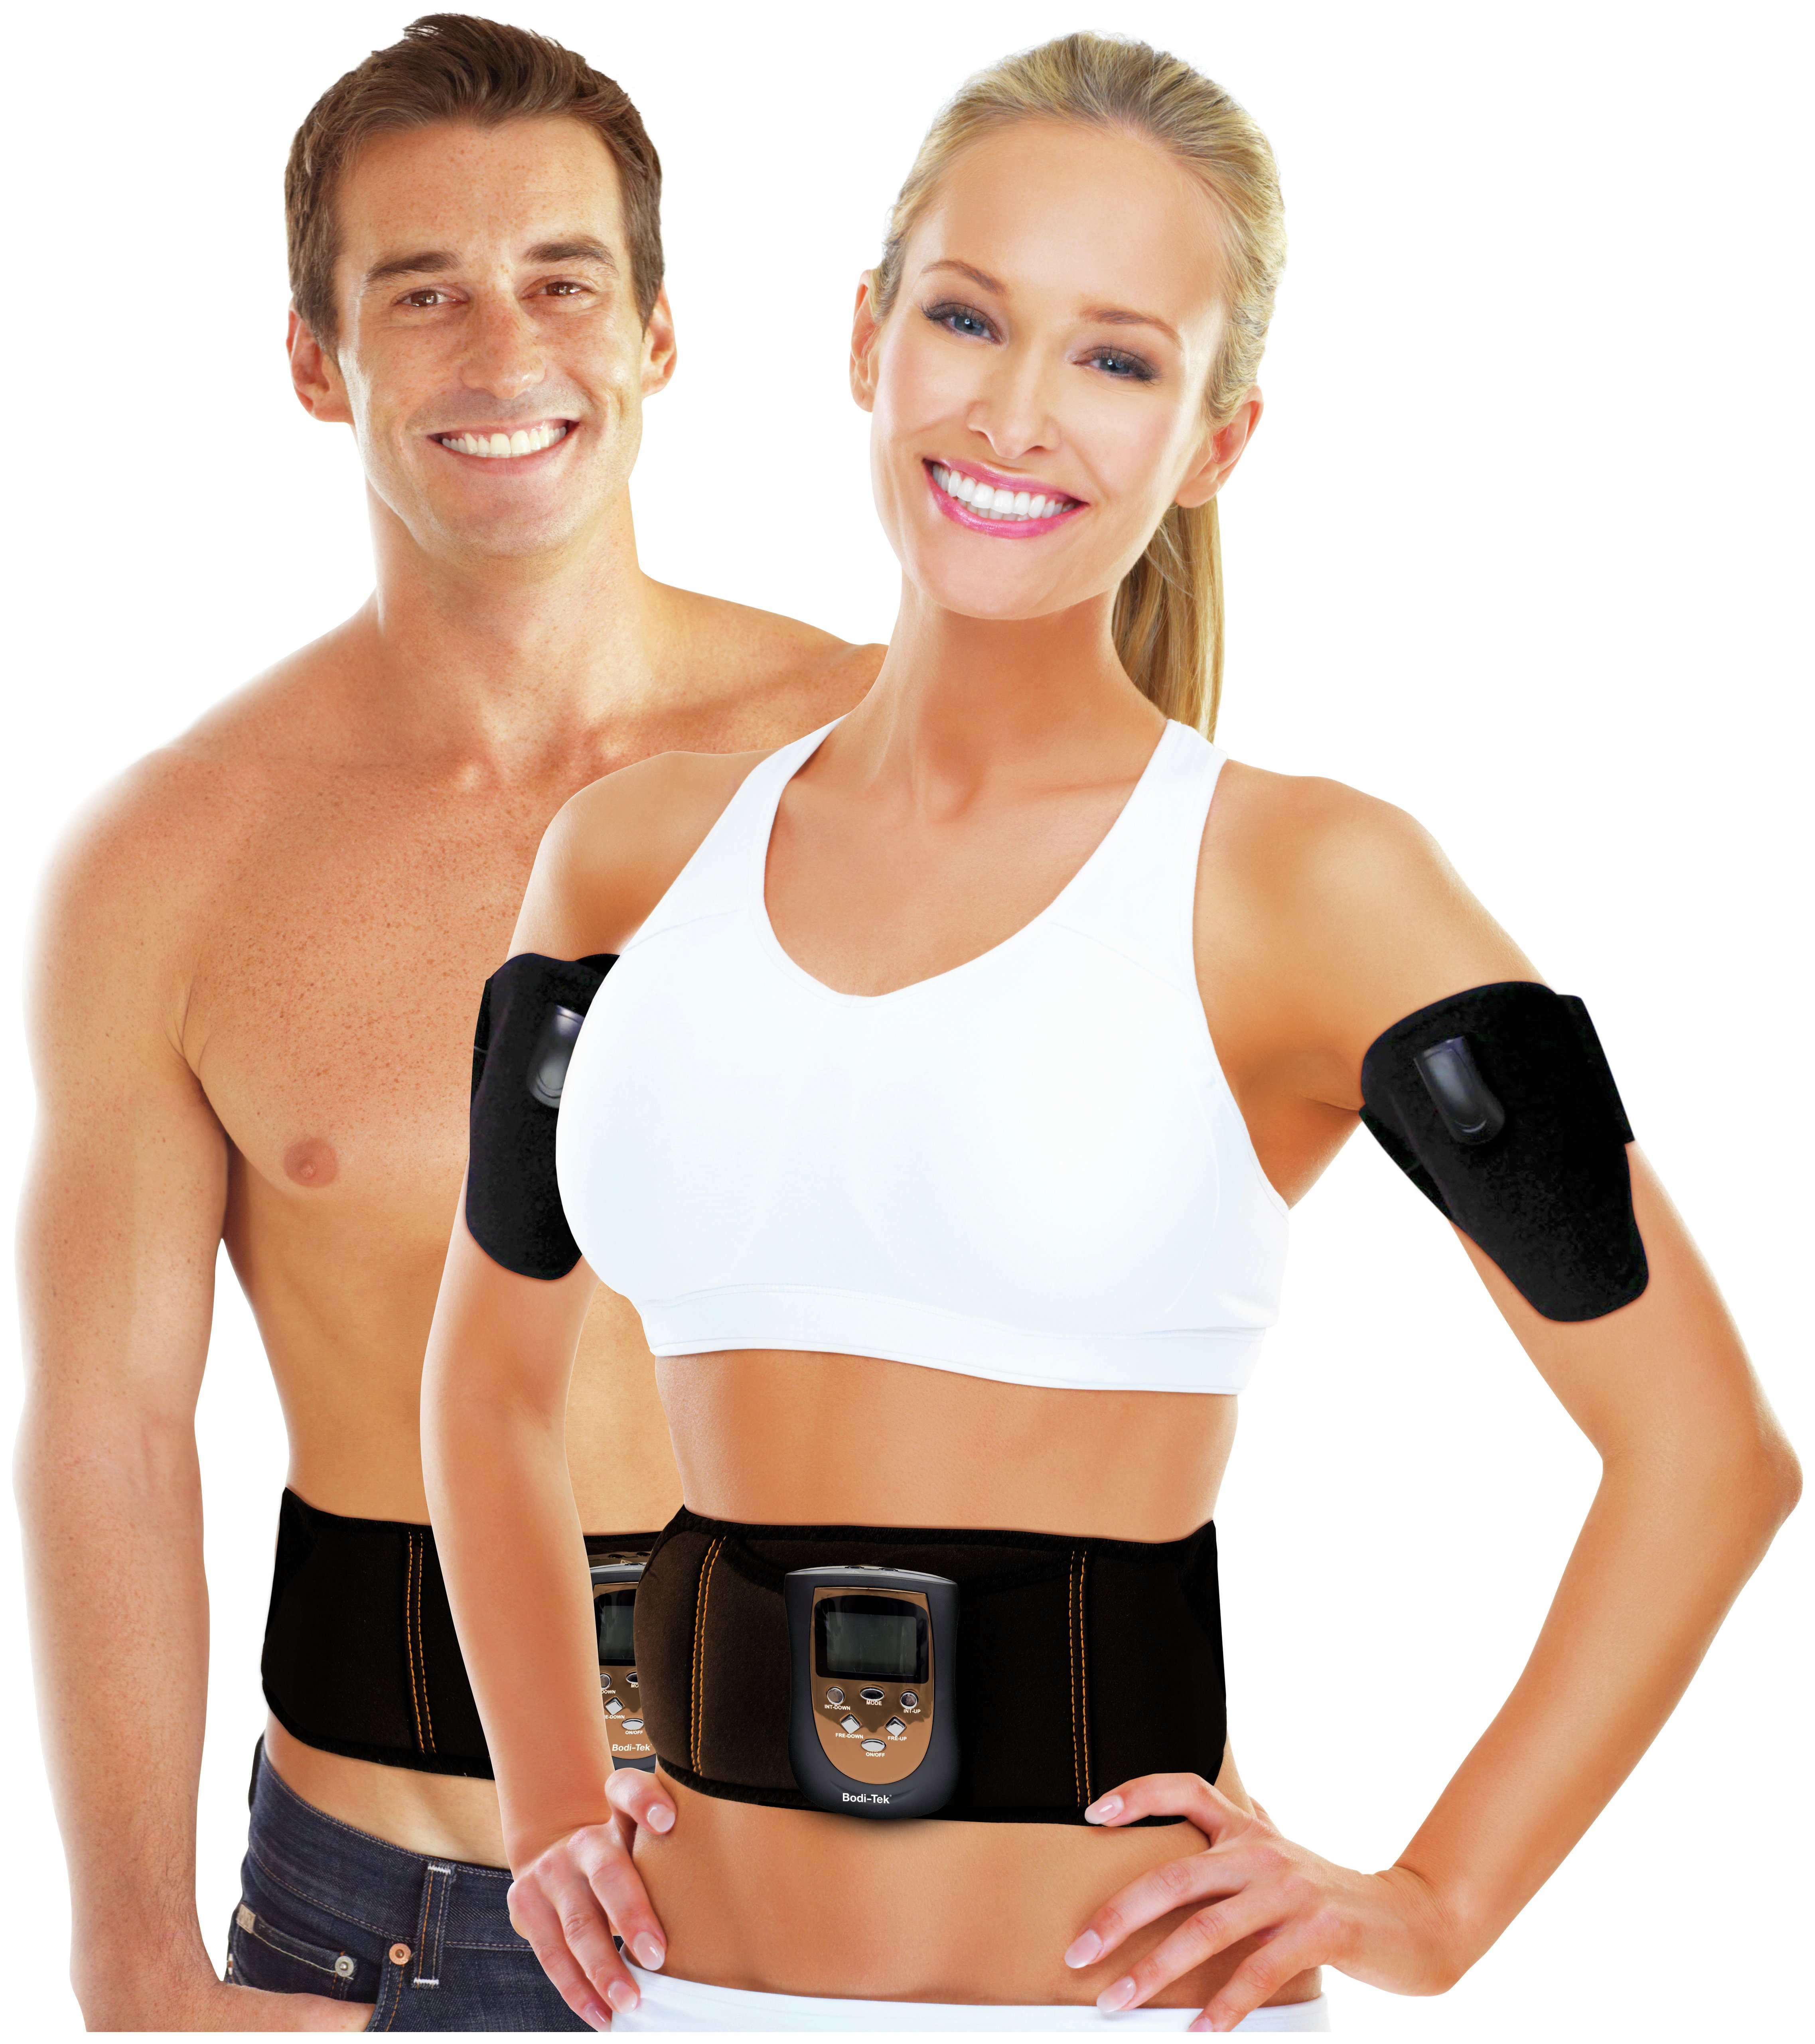 Image of Bodi-Tek Ab-Tek Pro Workout & Ab Toning Belt